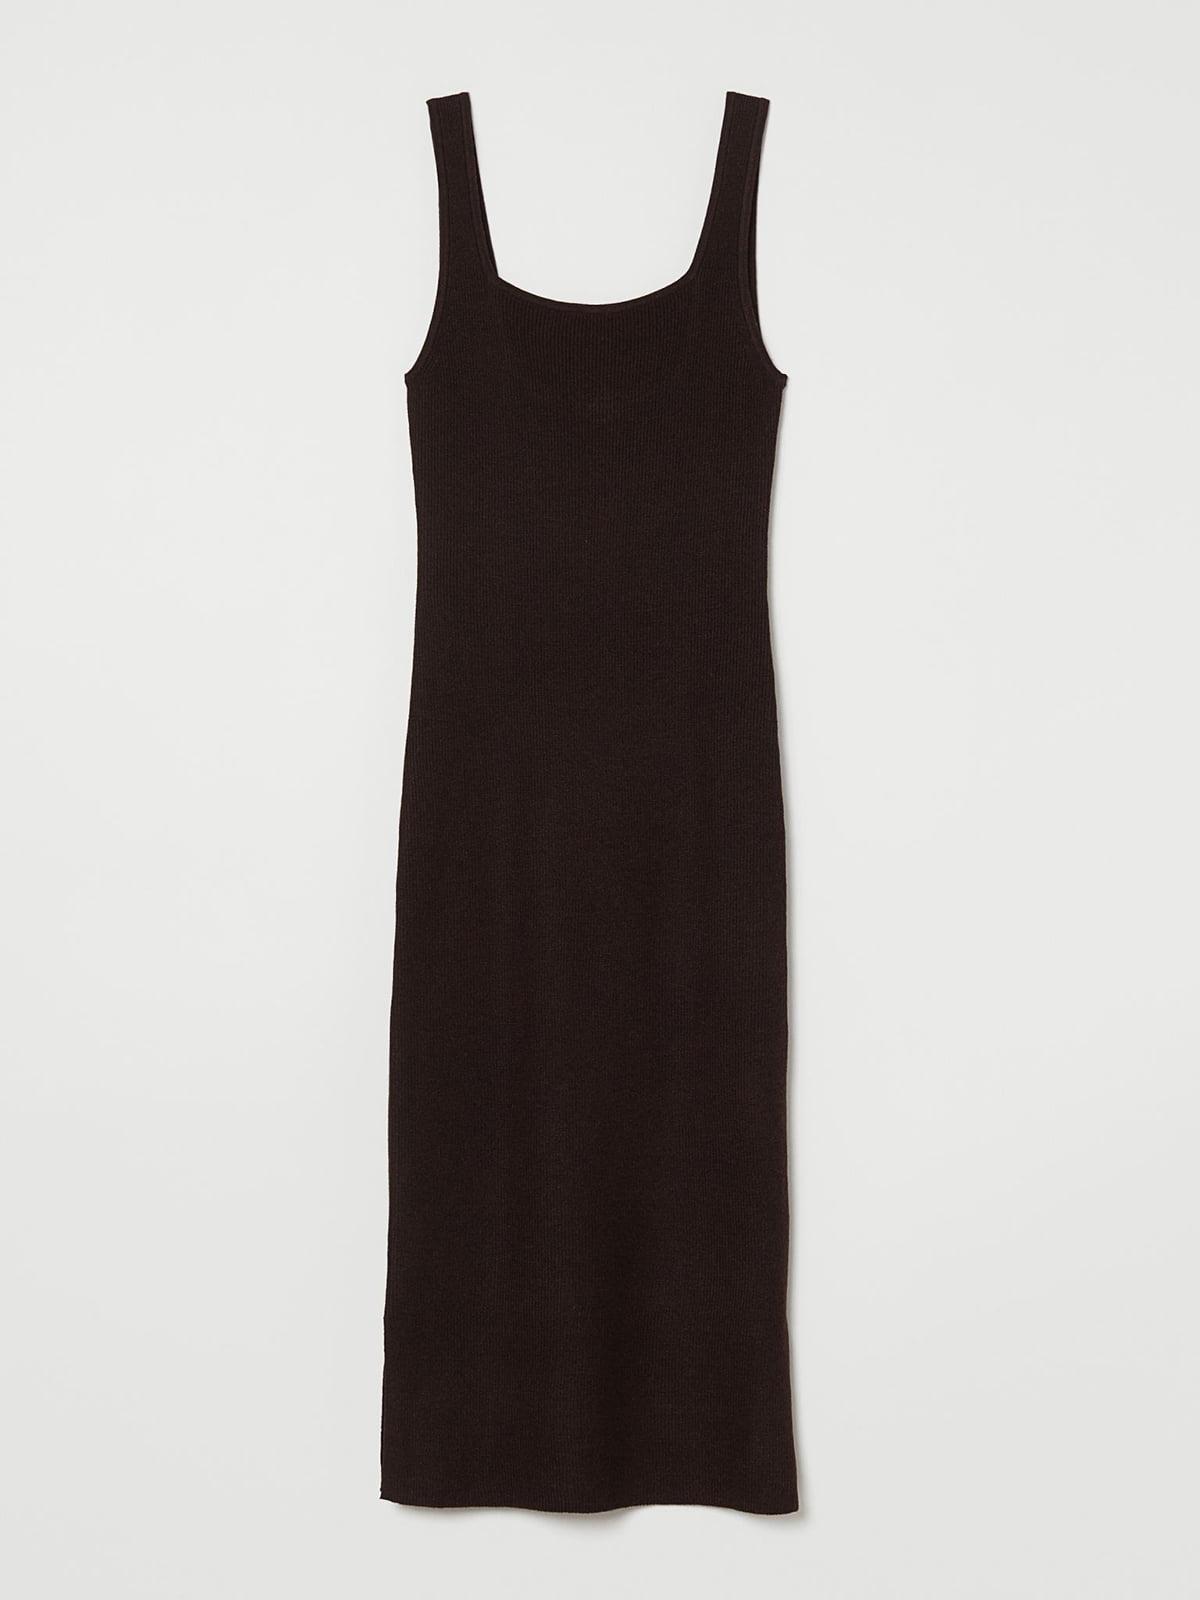 Платье коричневое   5623769